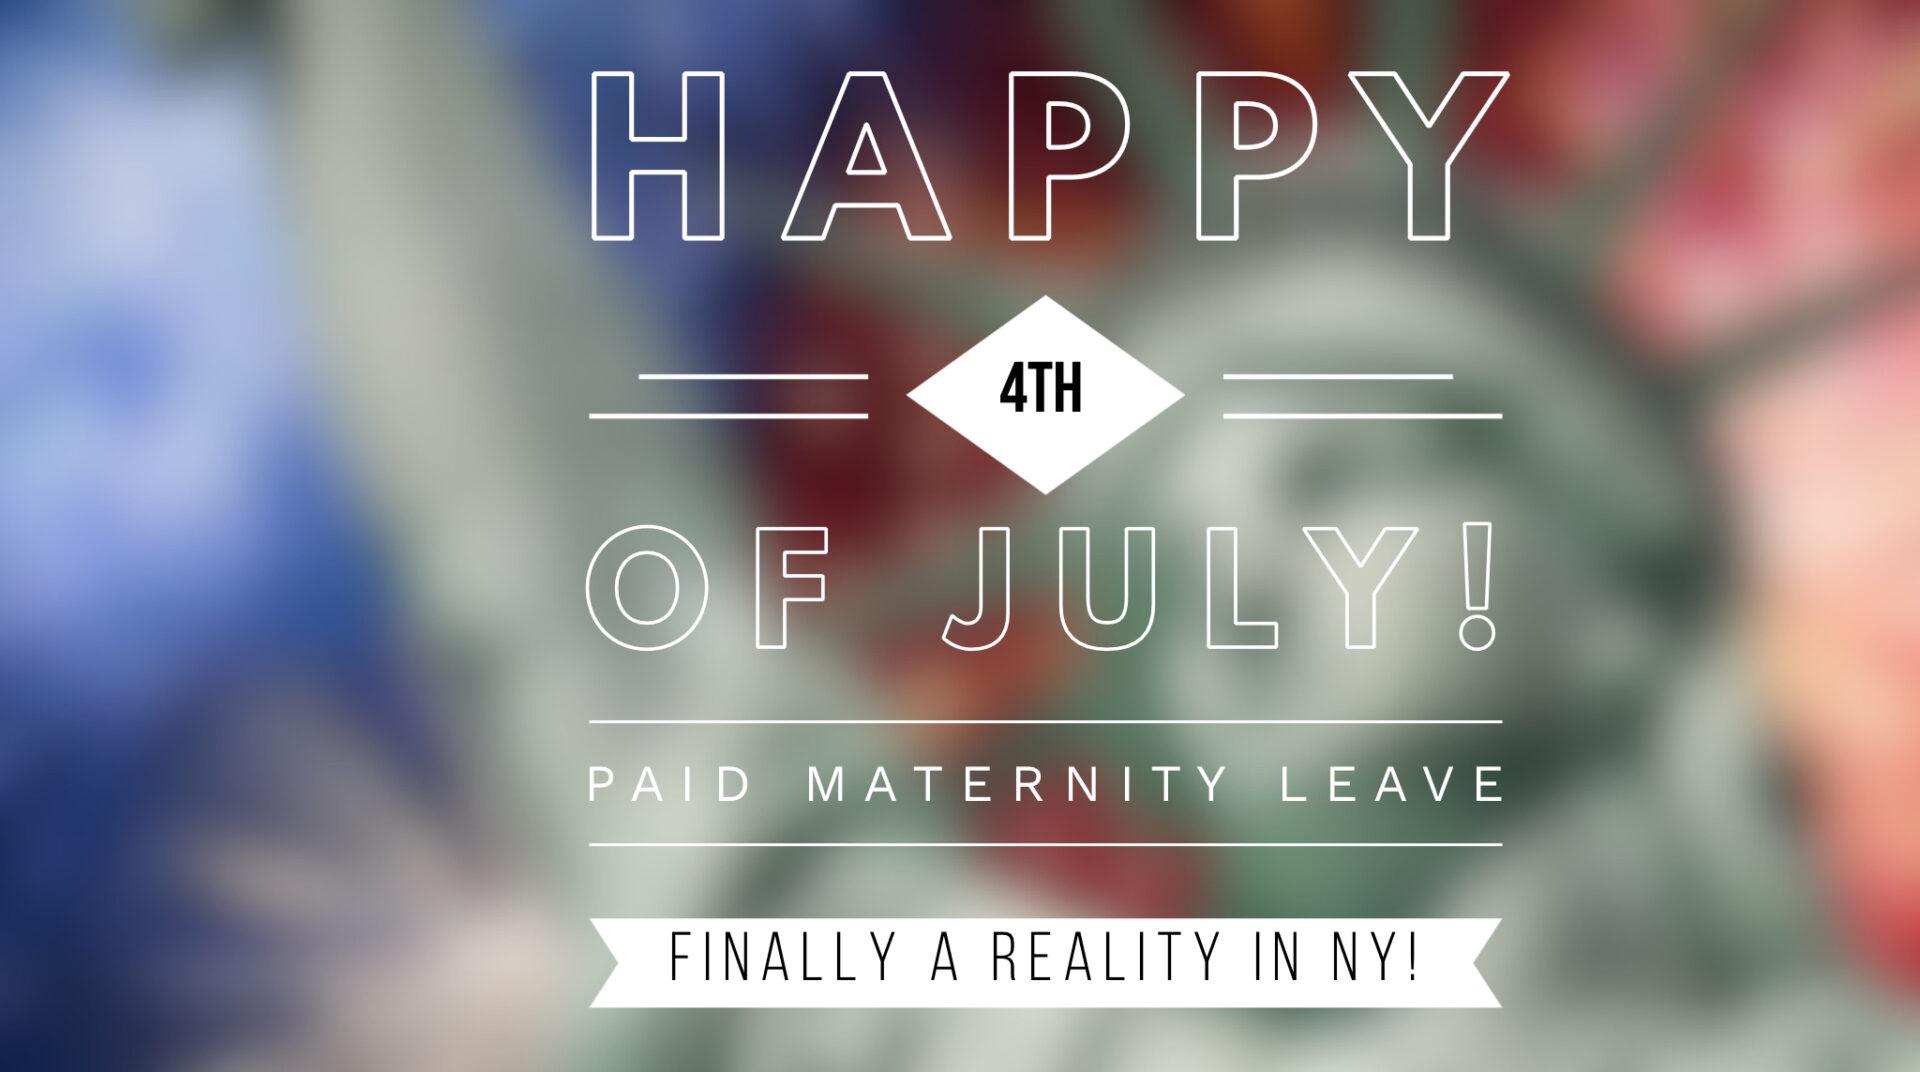 Happy Maternity Leave